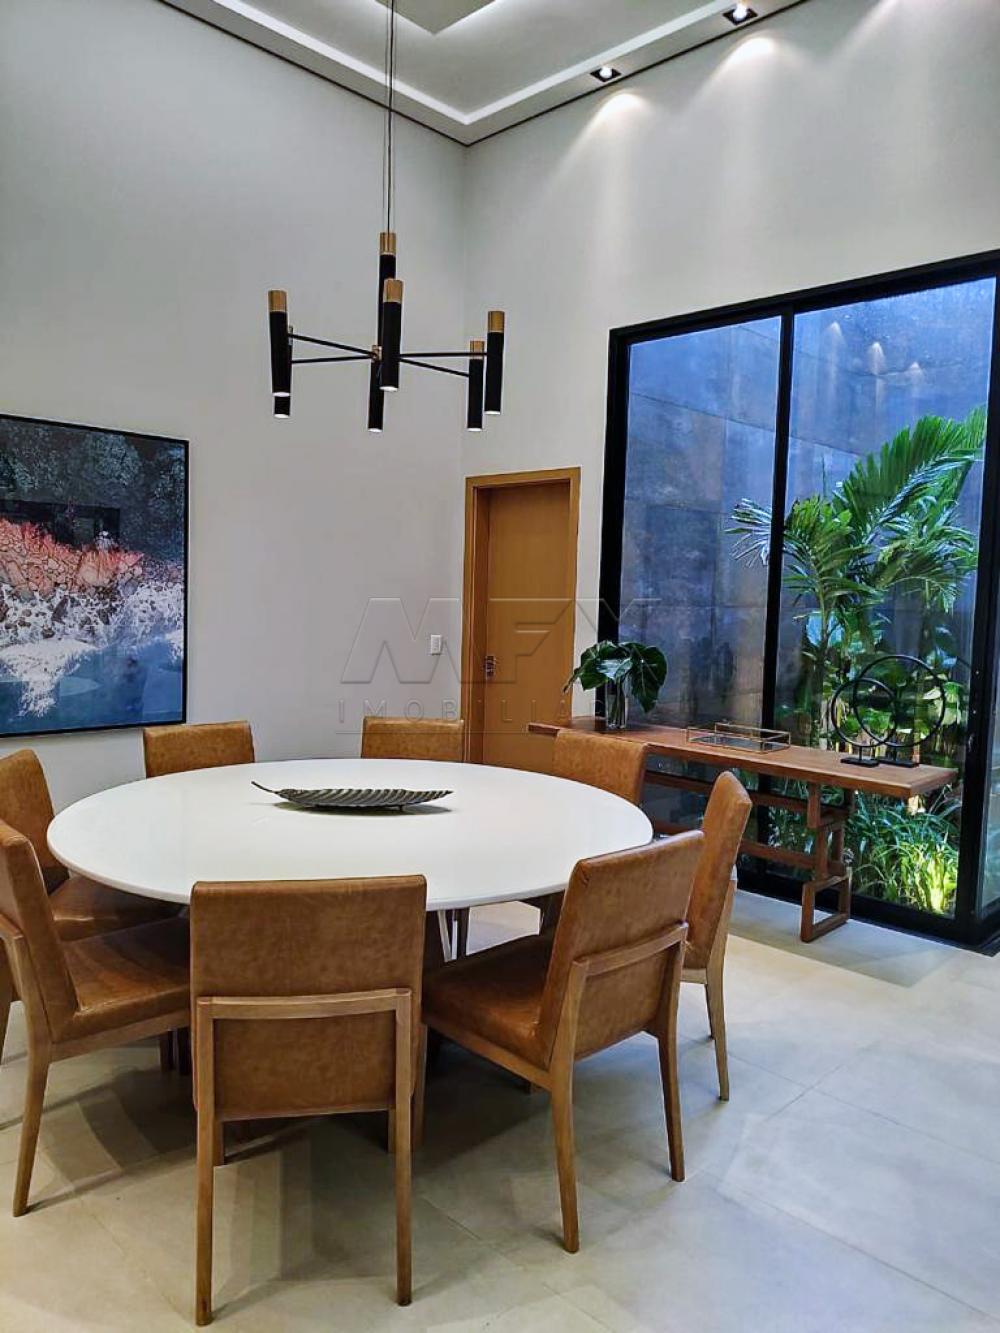 Comprar Casa / Condomínio em Bauru R$ 2.400.000,00 - Foto 3